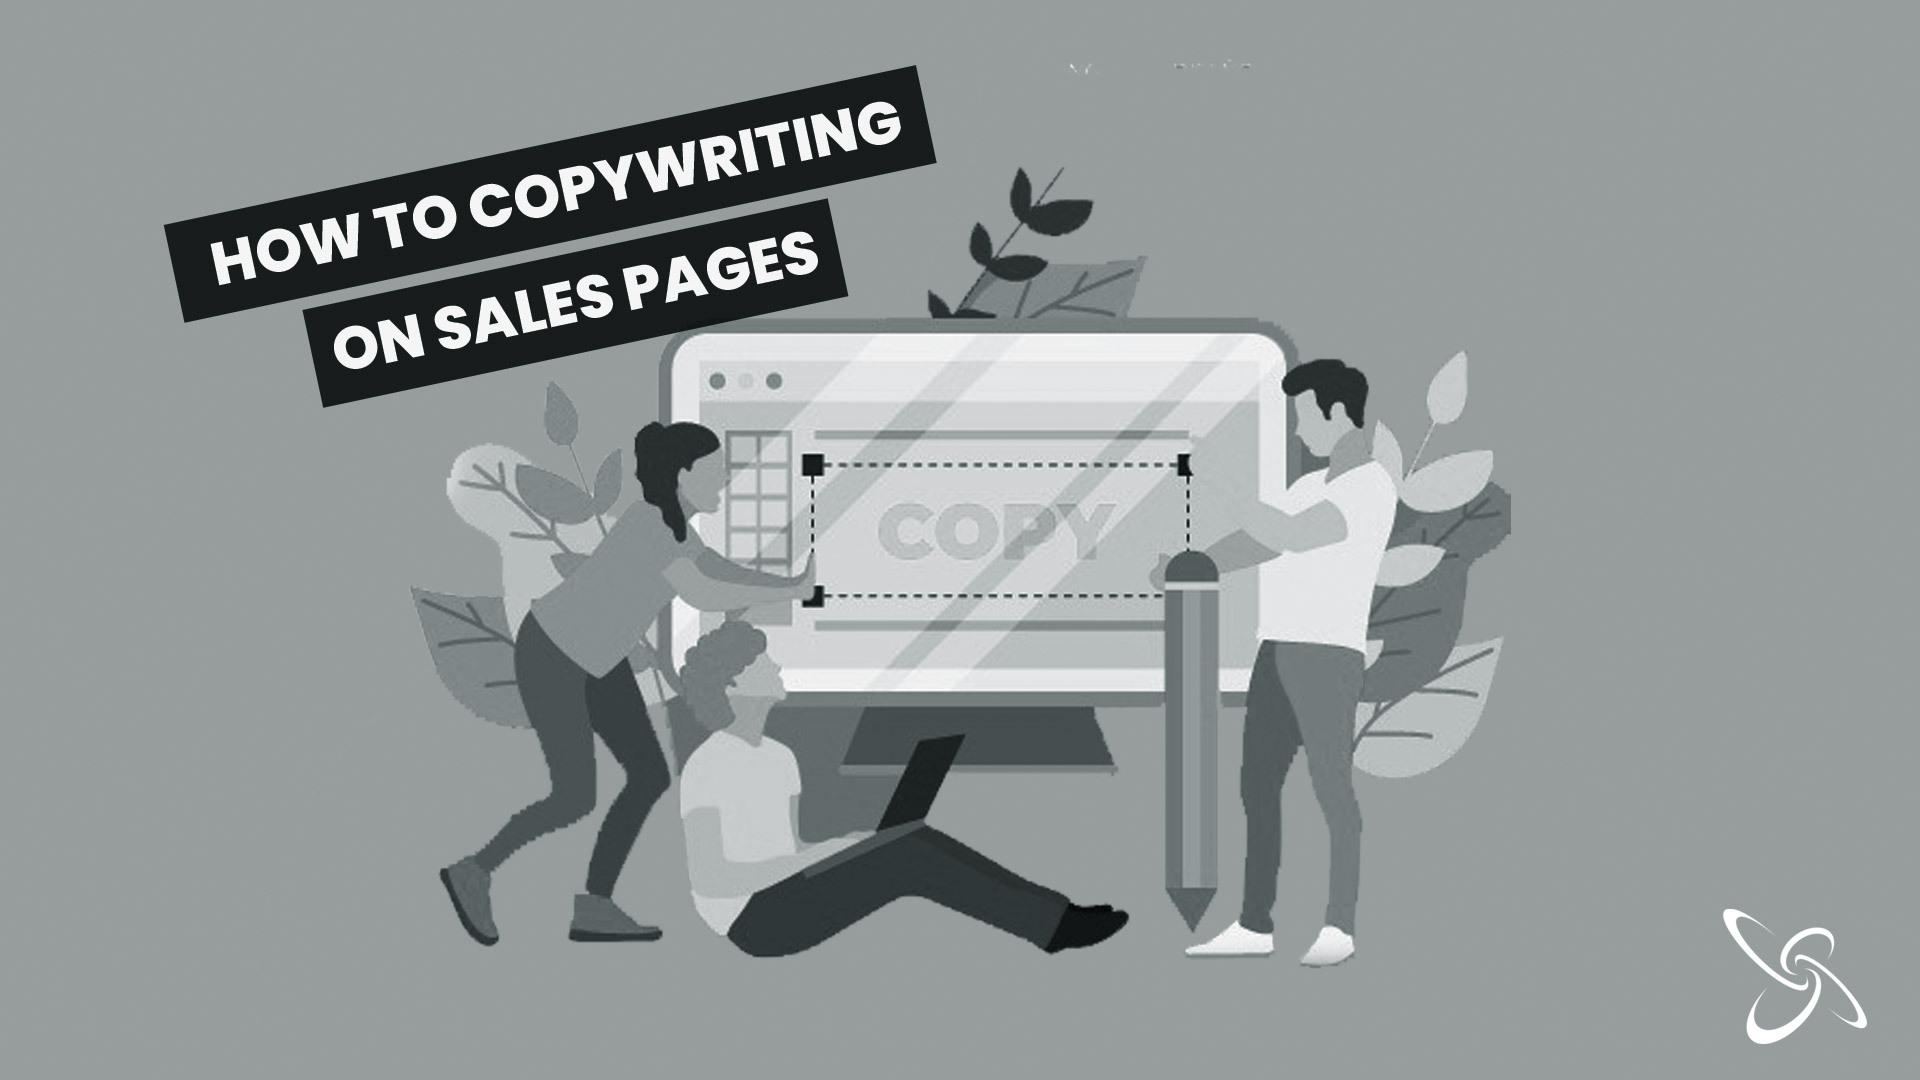 how to copywriting